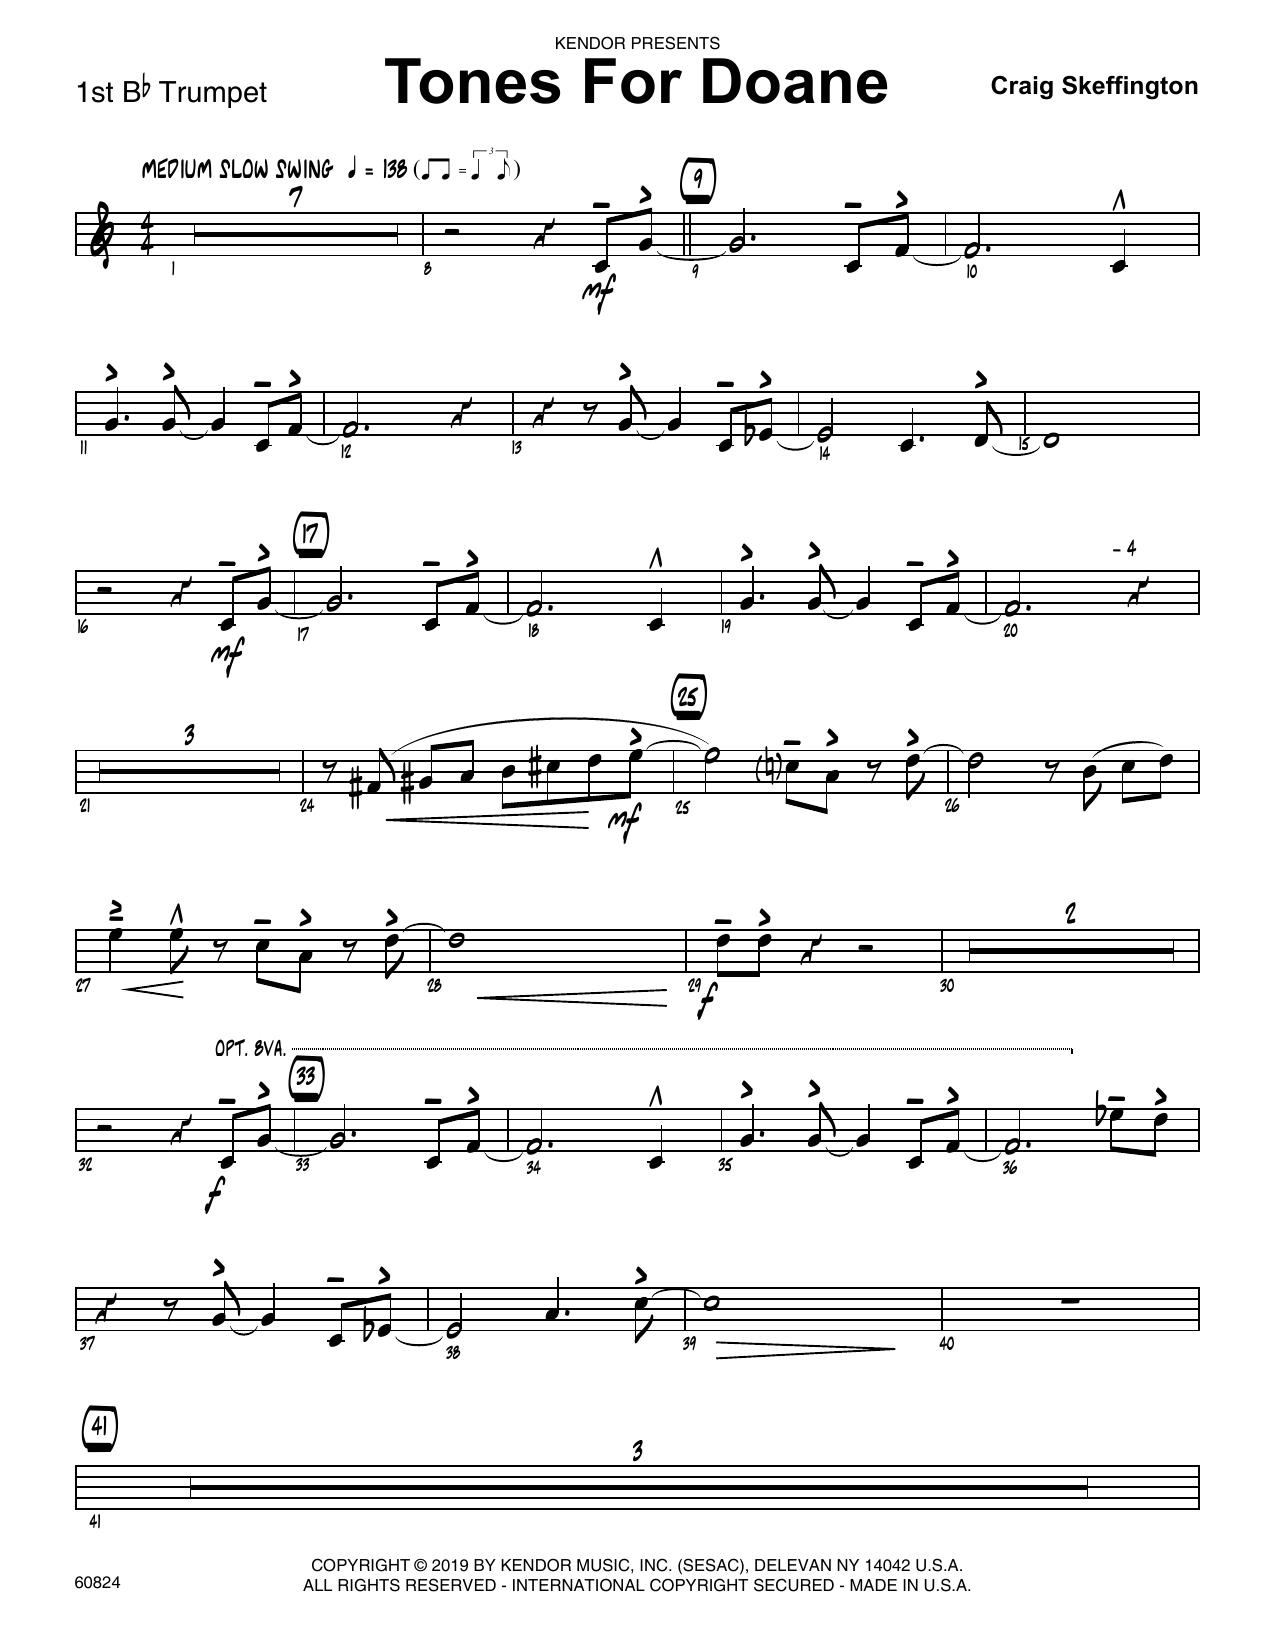 Craig Skeffington Tones For Doane - 1st Bb Trumpet sheet music notes and chords. Download Printable PDF.